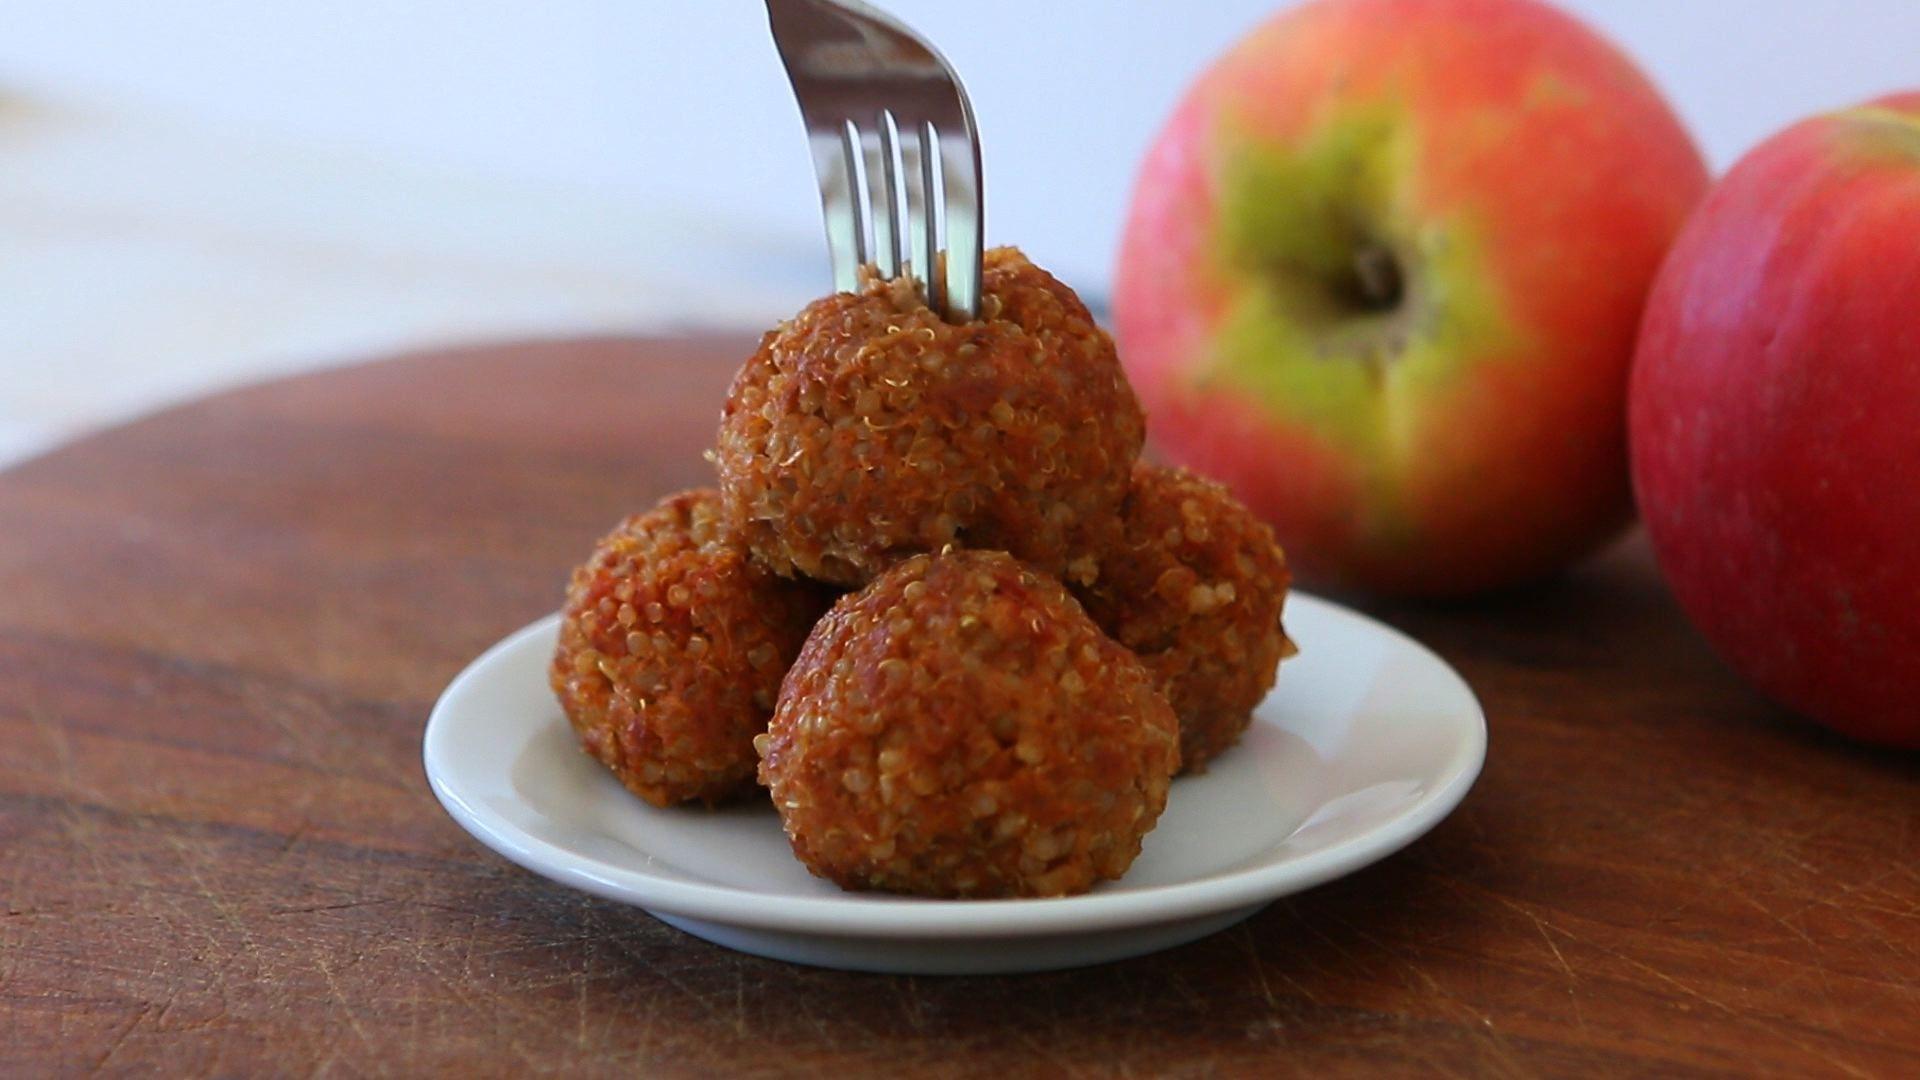 Quinoa beef meatballs recipe - baby finger food | Recipe ...